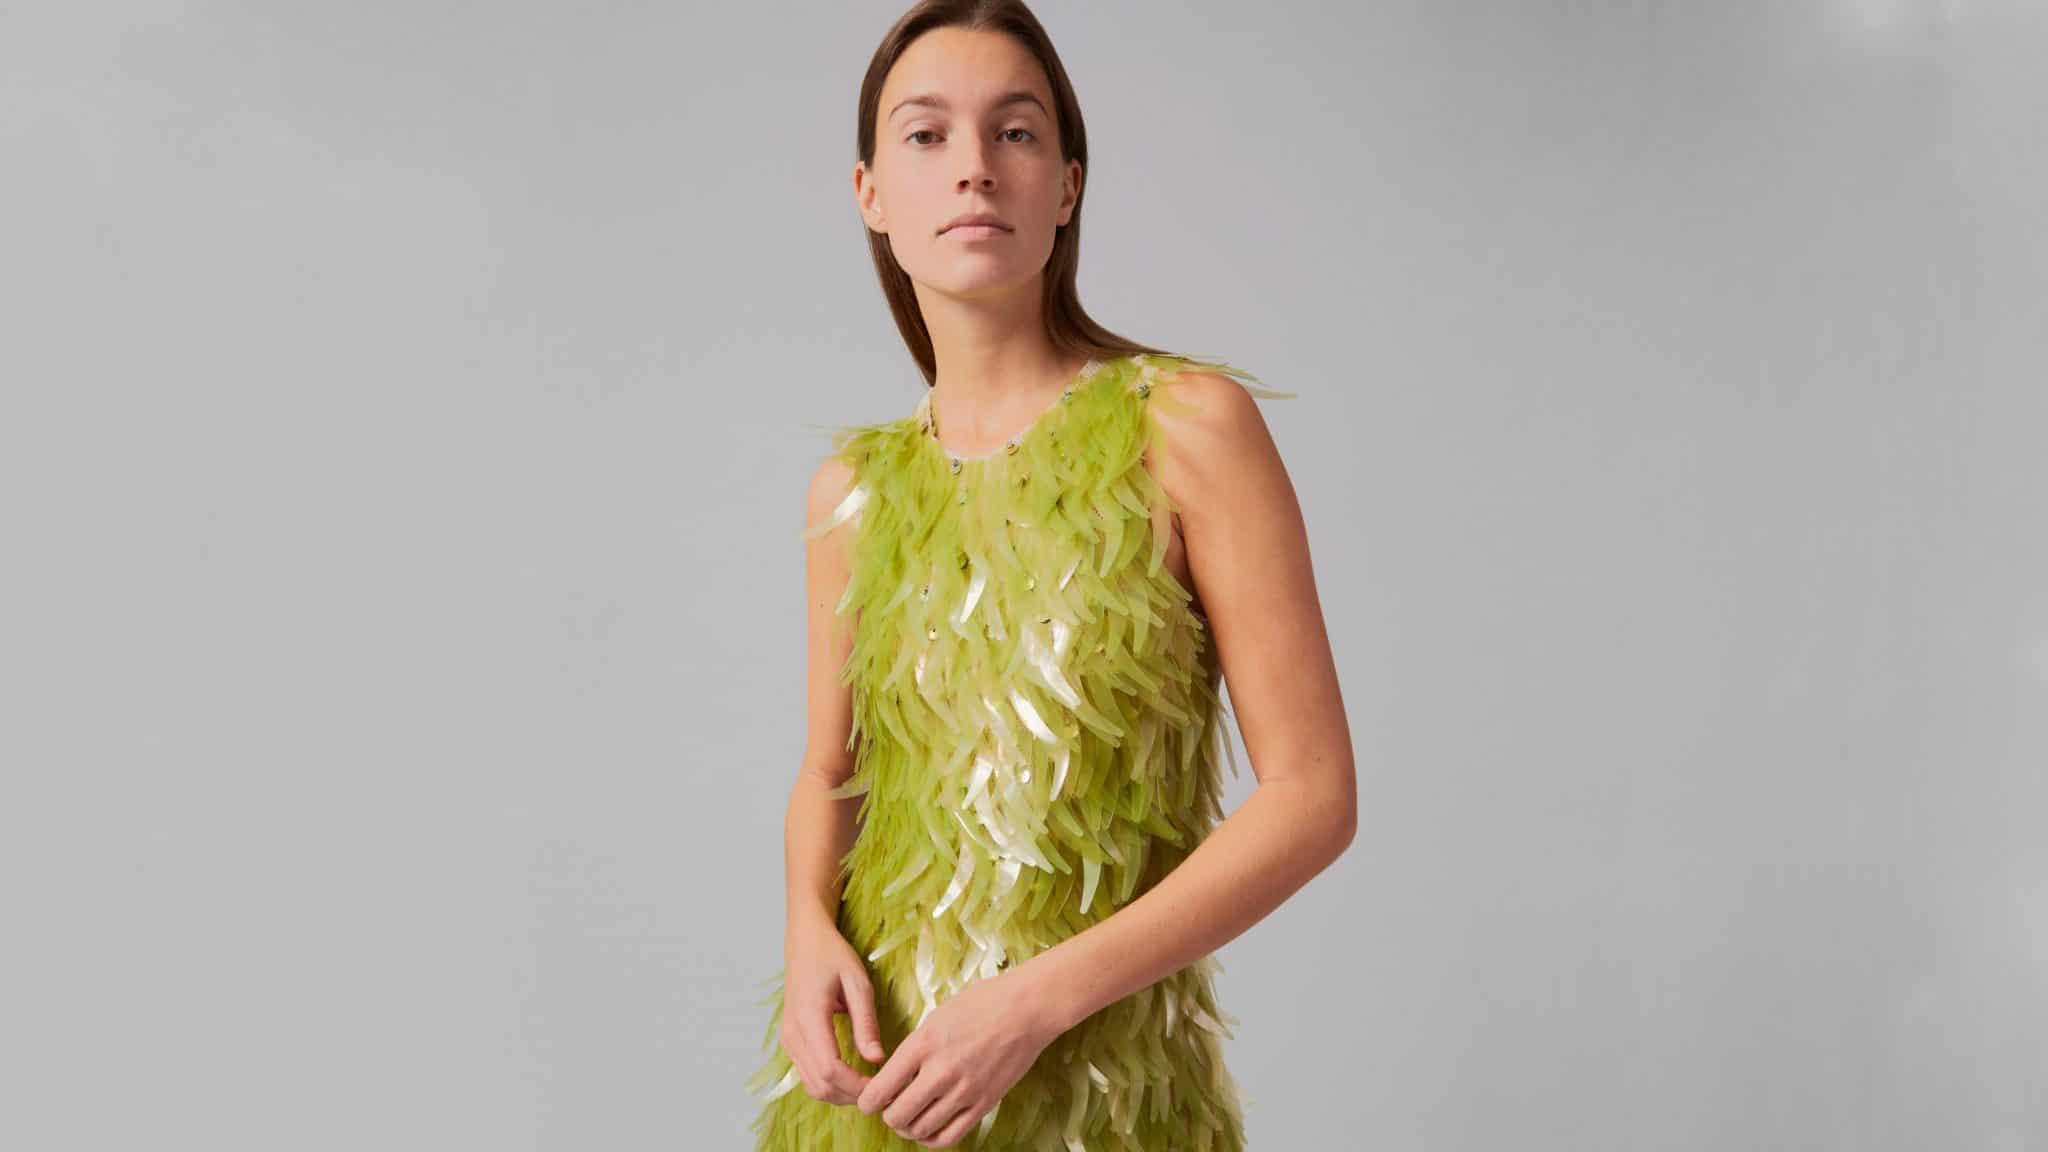 Phillip Lim en Charlotte McCurdy maken jurk van algen